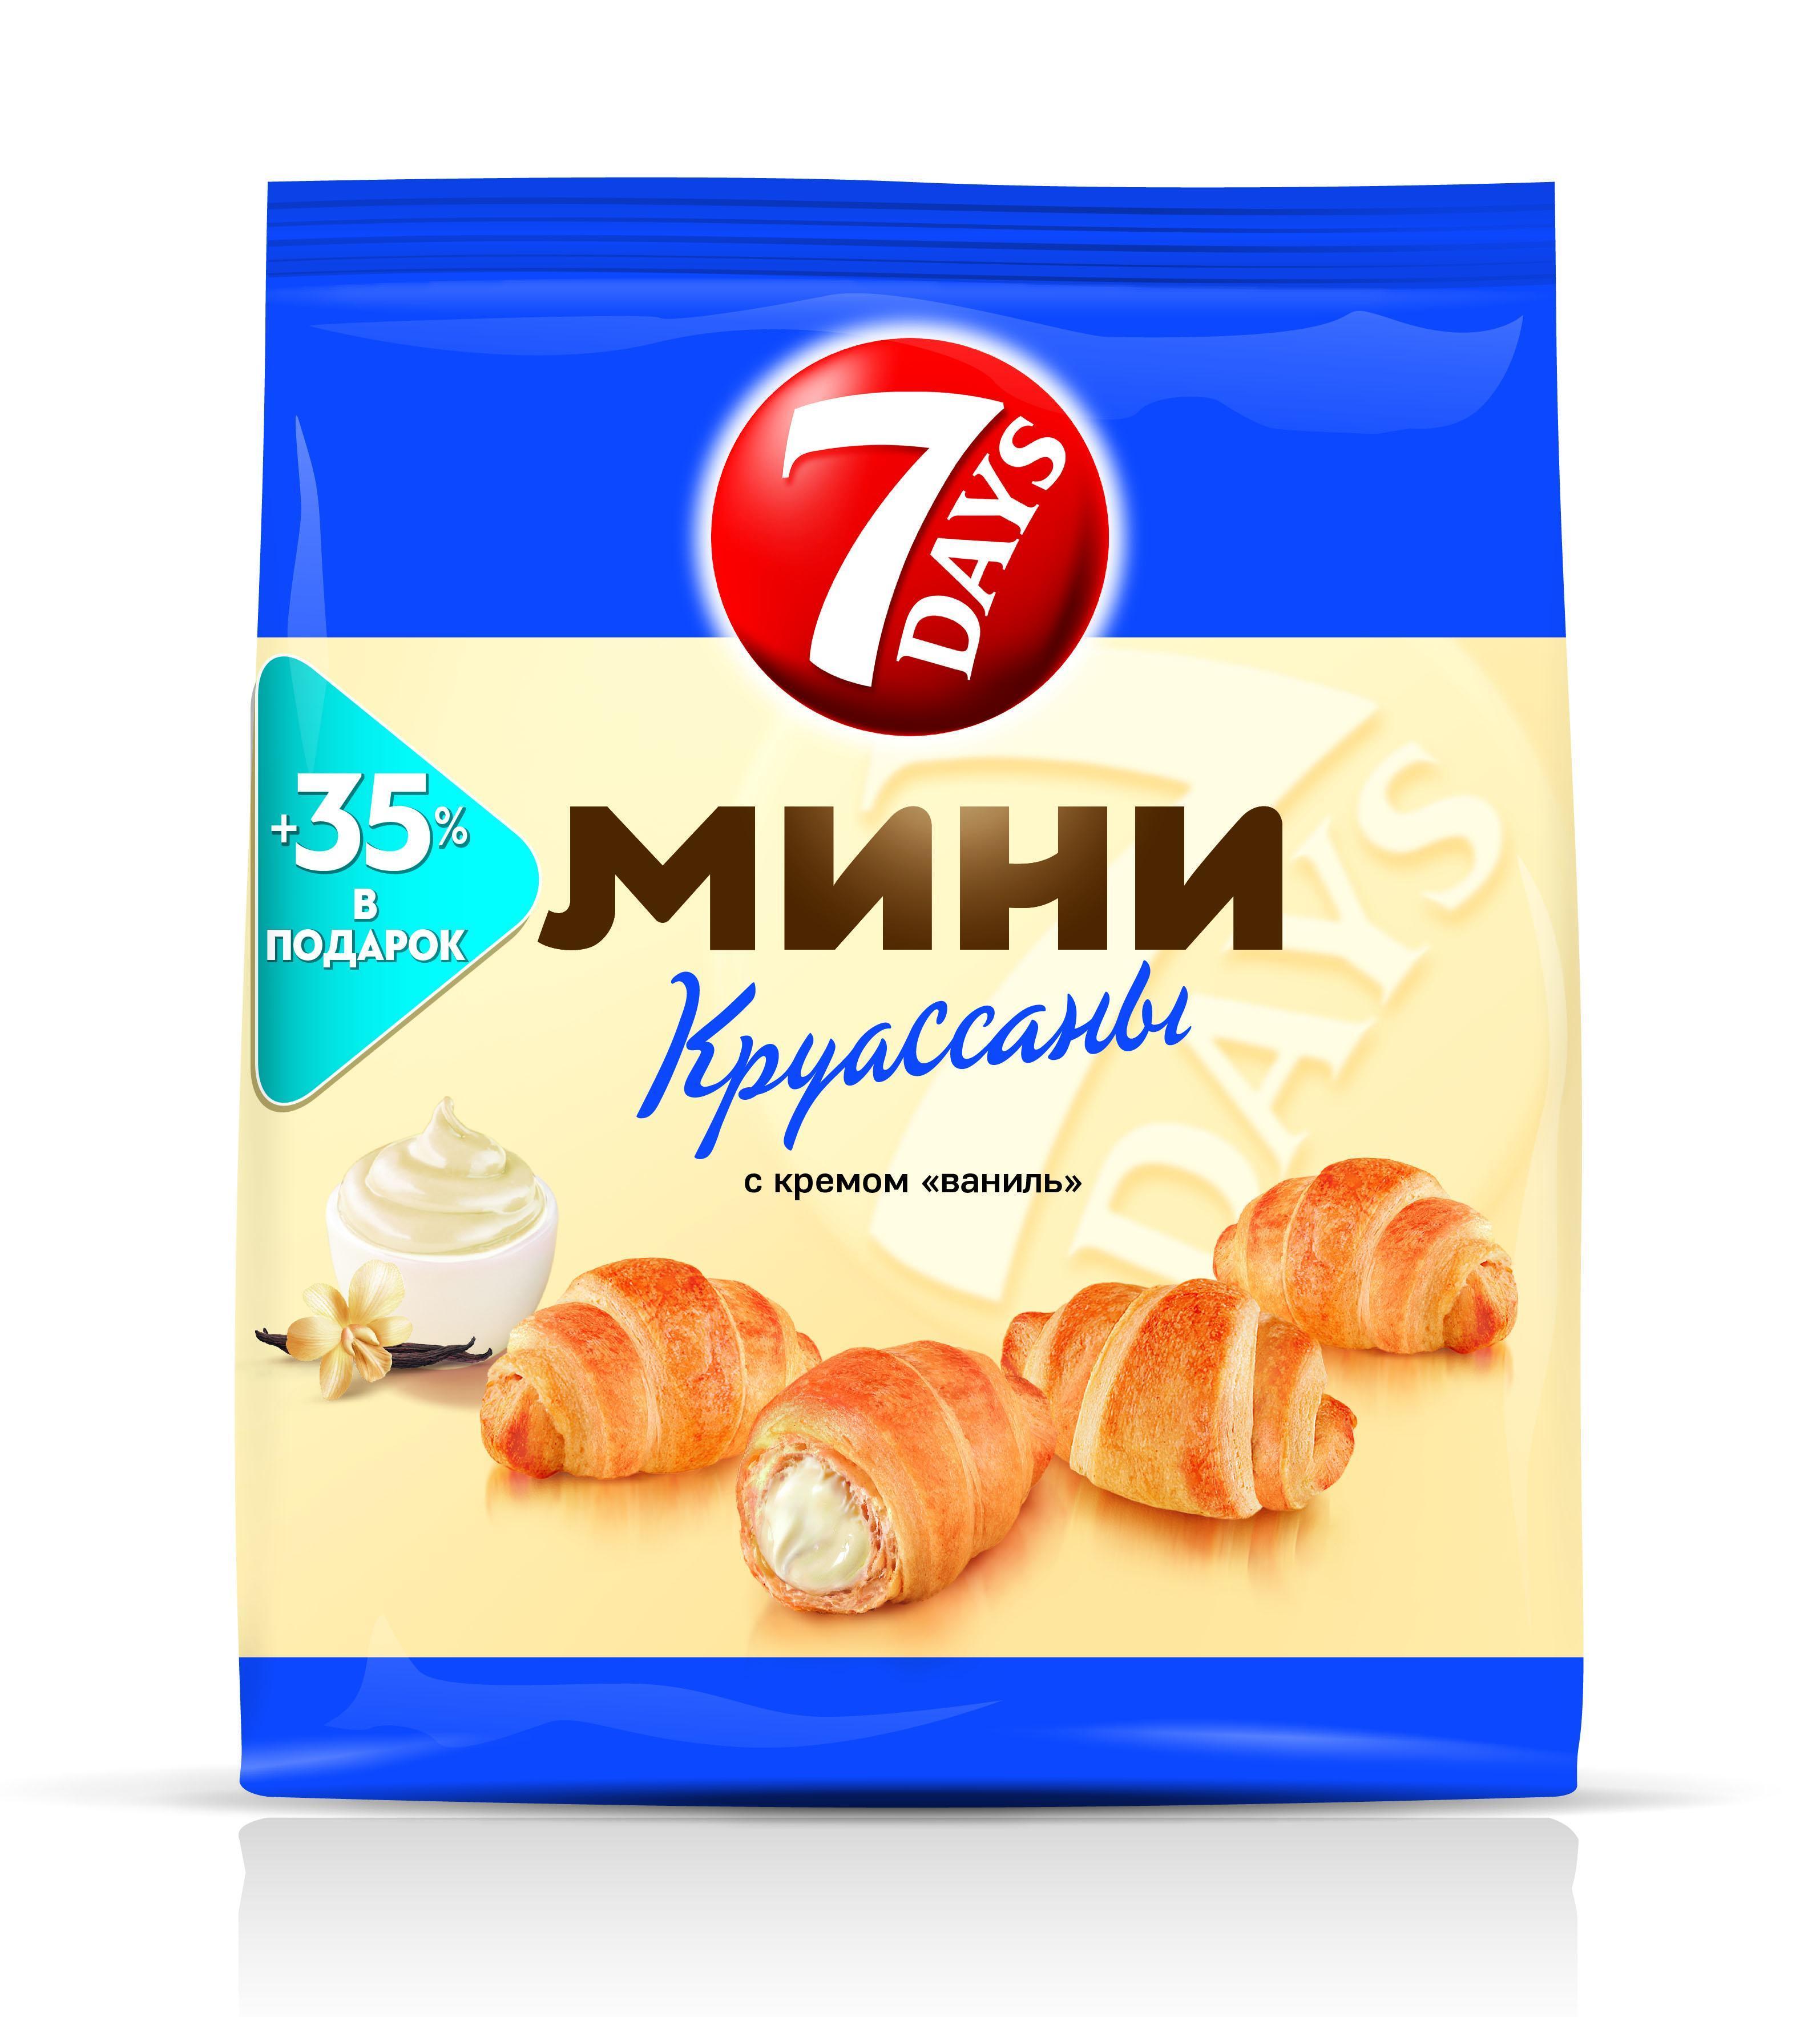 Мини круассаны 7DAYS c кремом ваниль